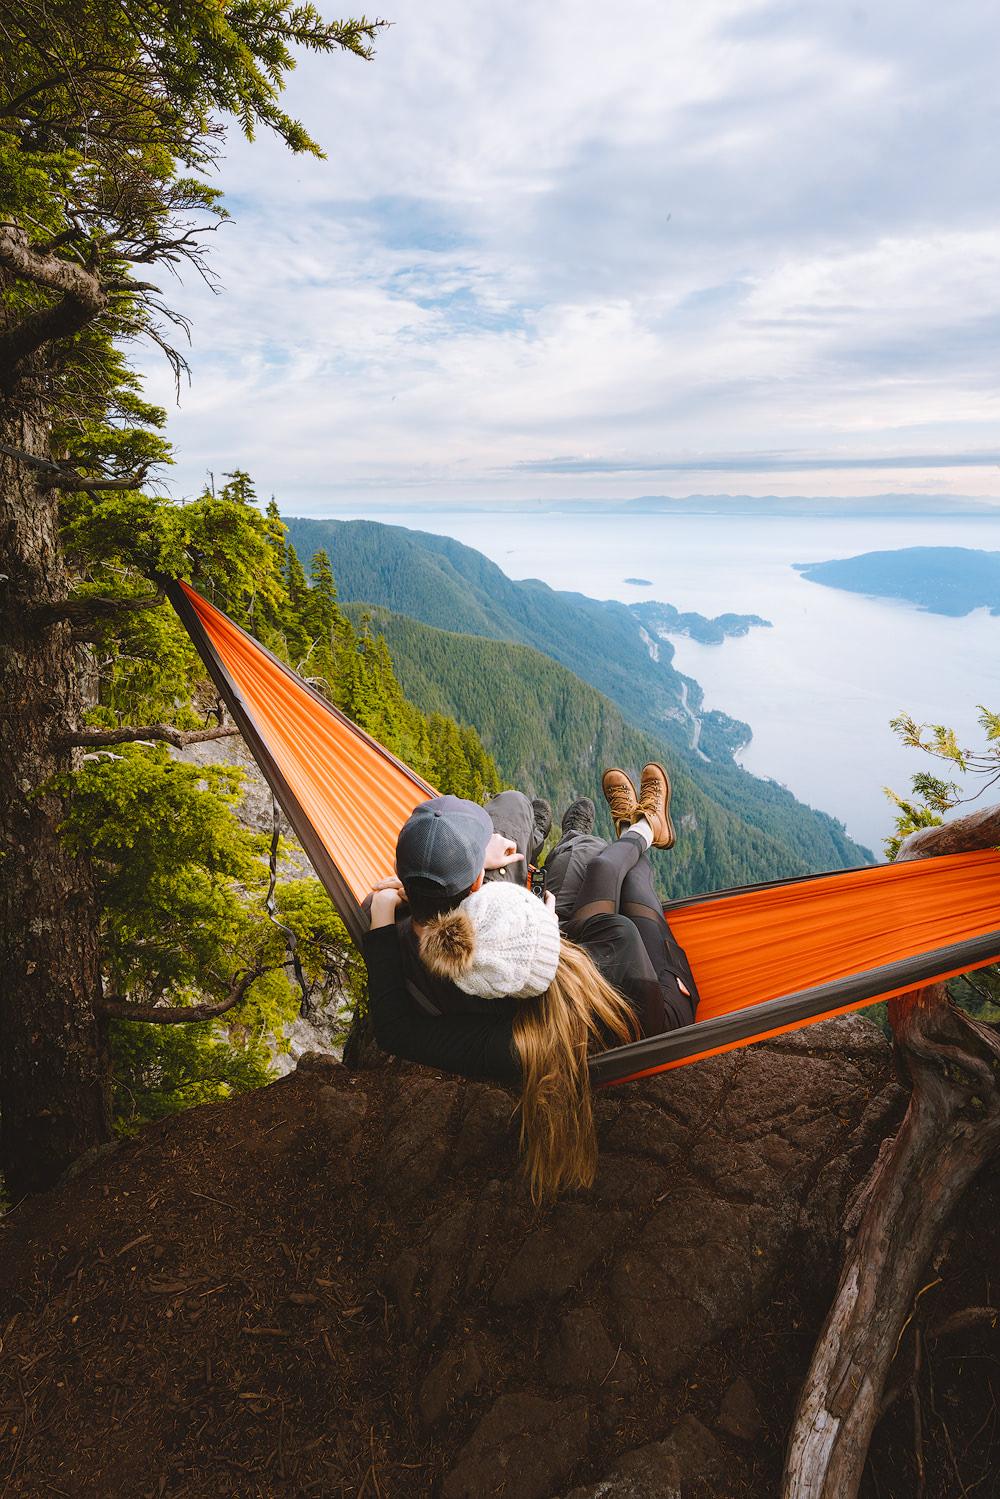 Couples Adventure Getaway to British ColumbiaSt Marks Summit Vancouver 2